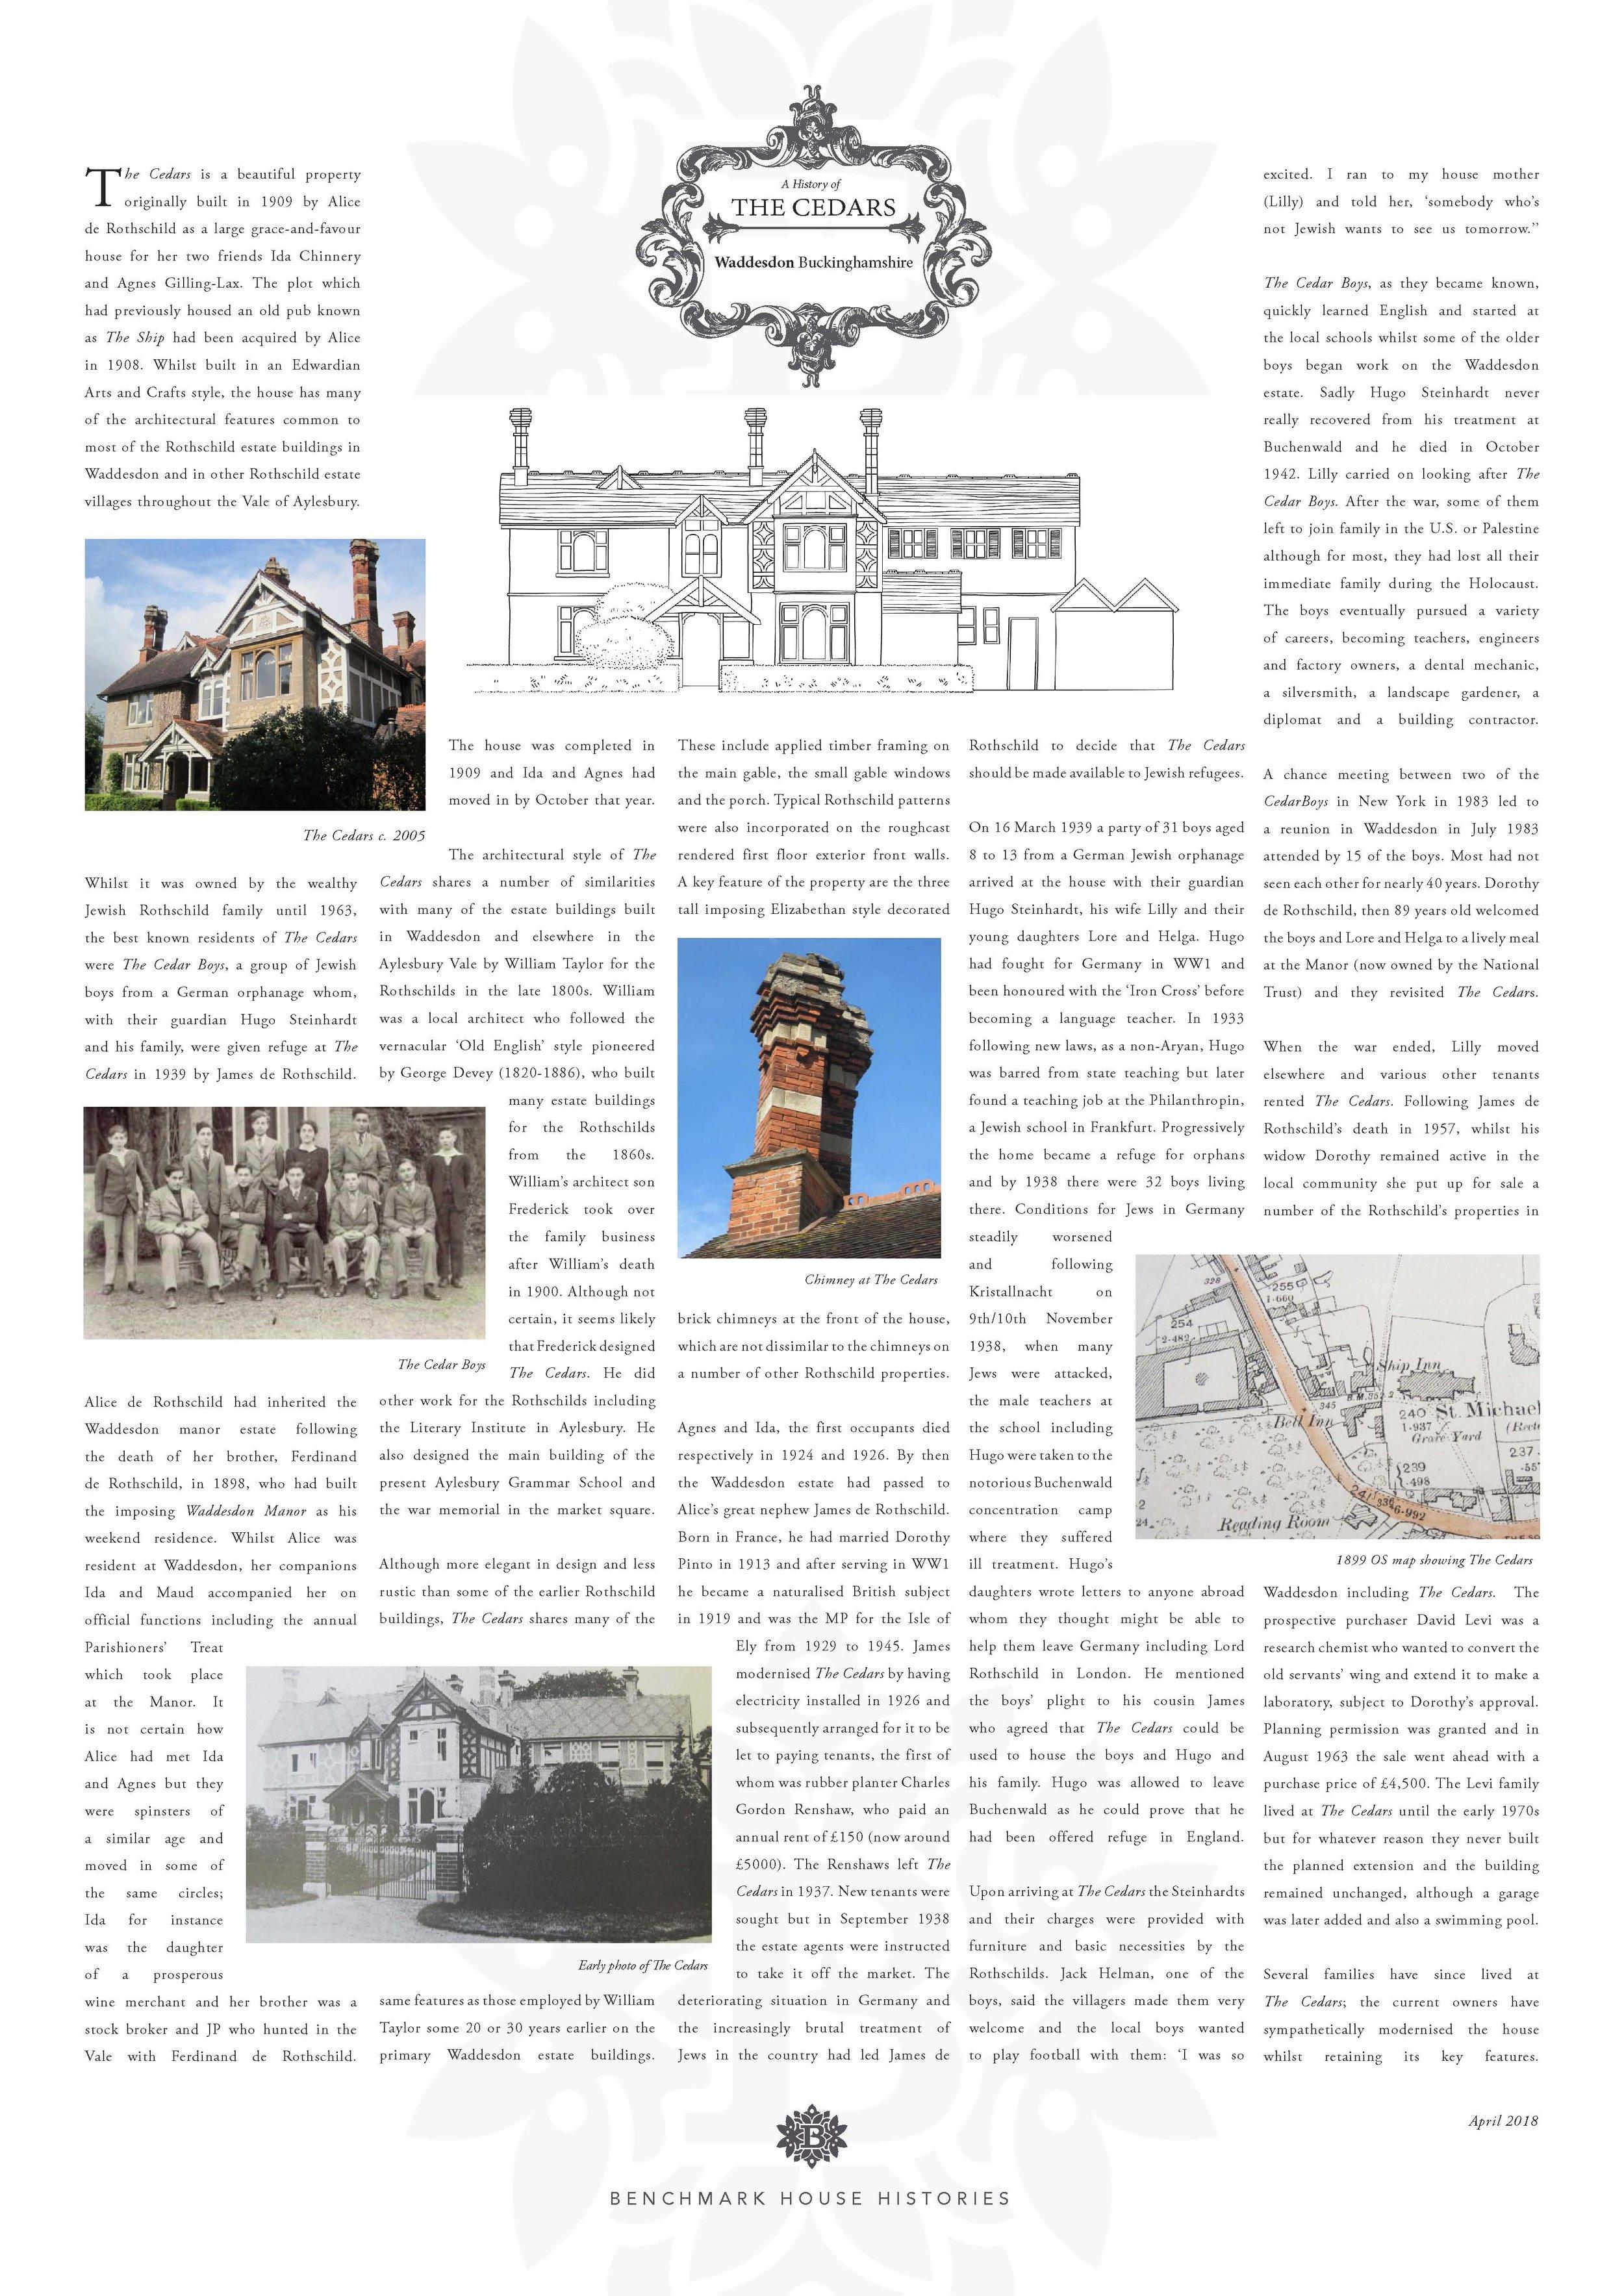 WALL_HOUSE_HISTORY_The_Cedars_Waddesdon_180418.jpg